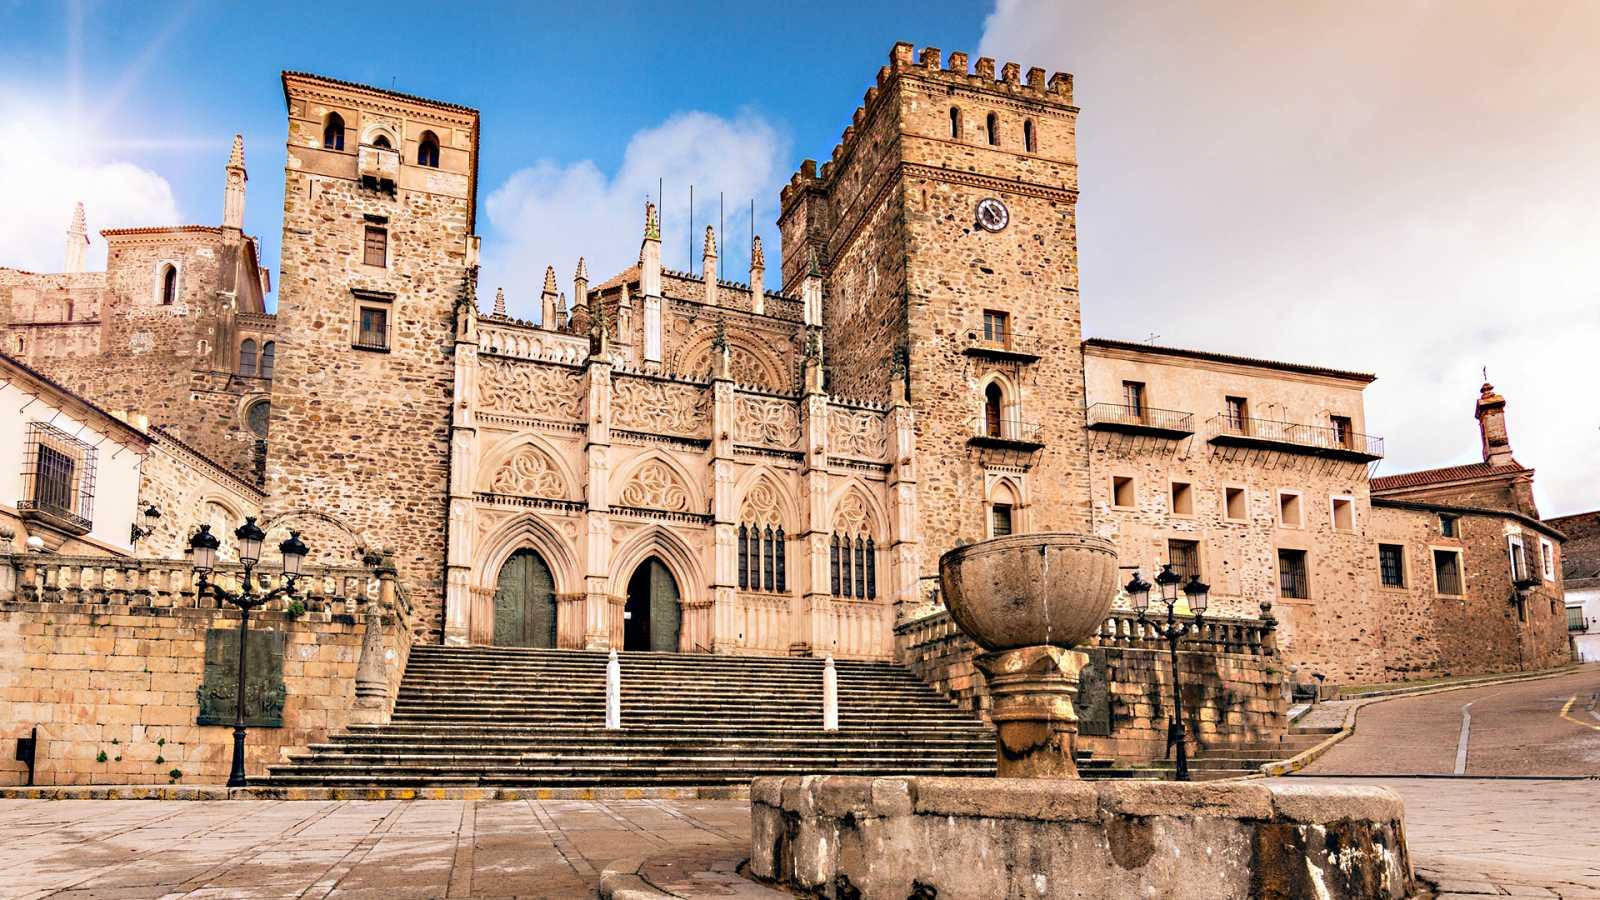 En clave Turismo - Rutas de interior, de Cáceres a Pamplona - 13/05/21 - escuchar ahora